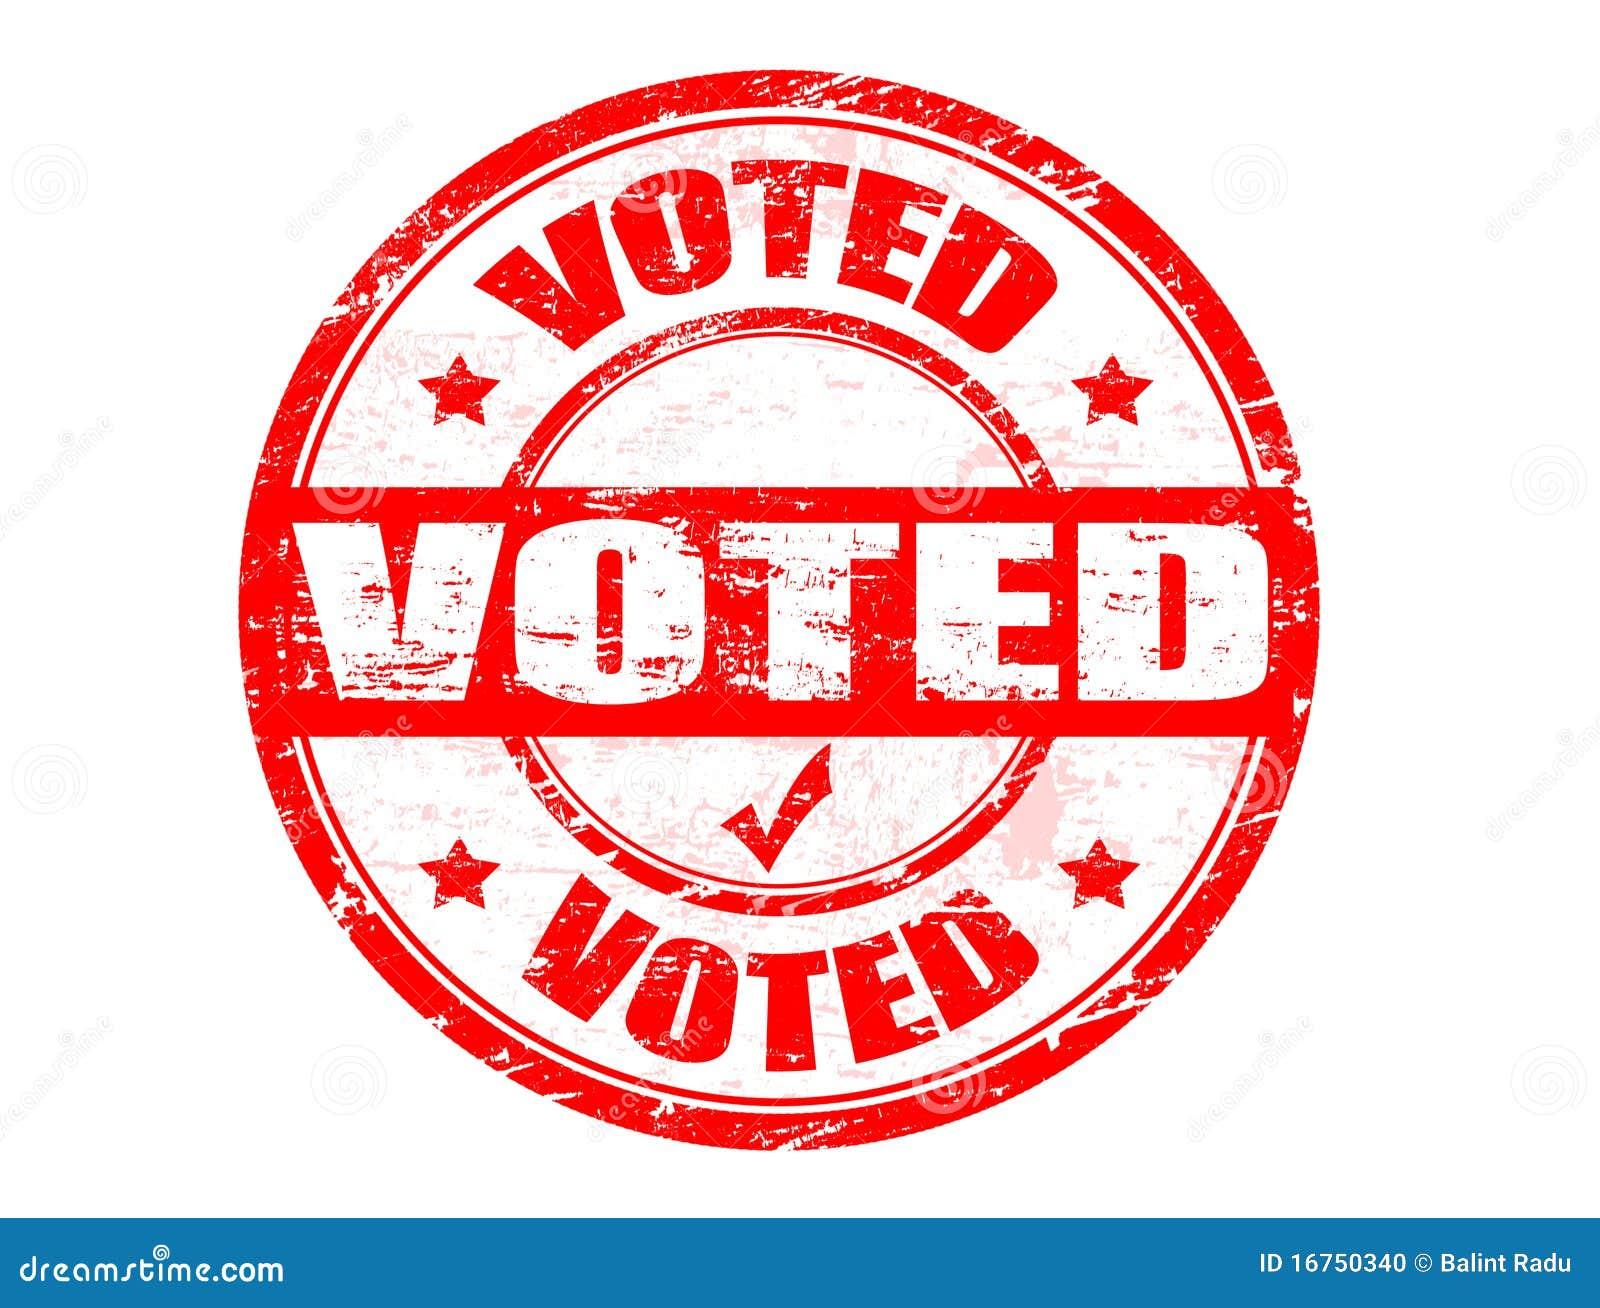 Voted Stamp Stock Photo